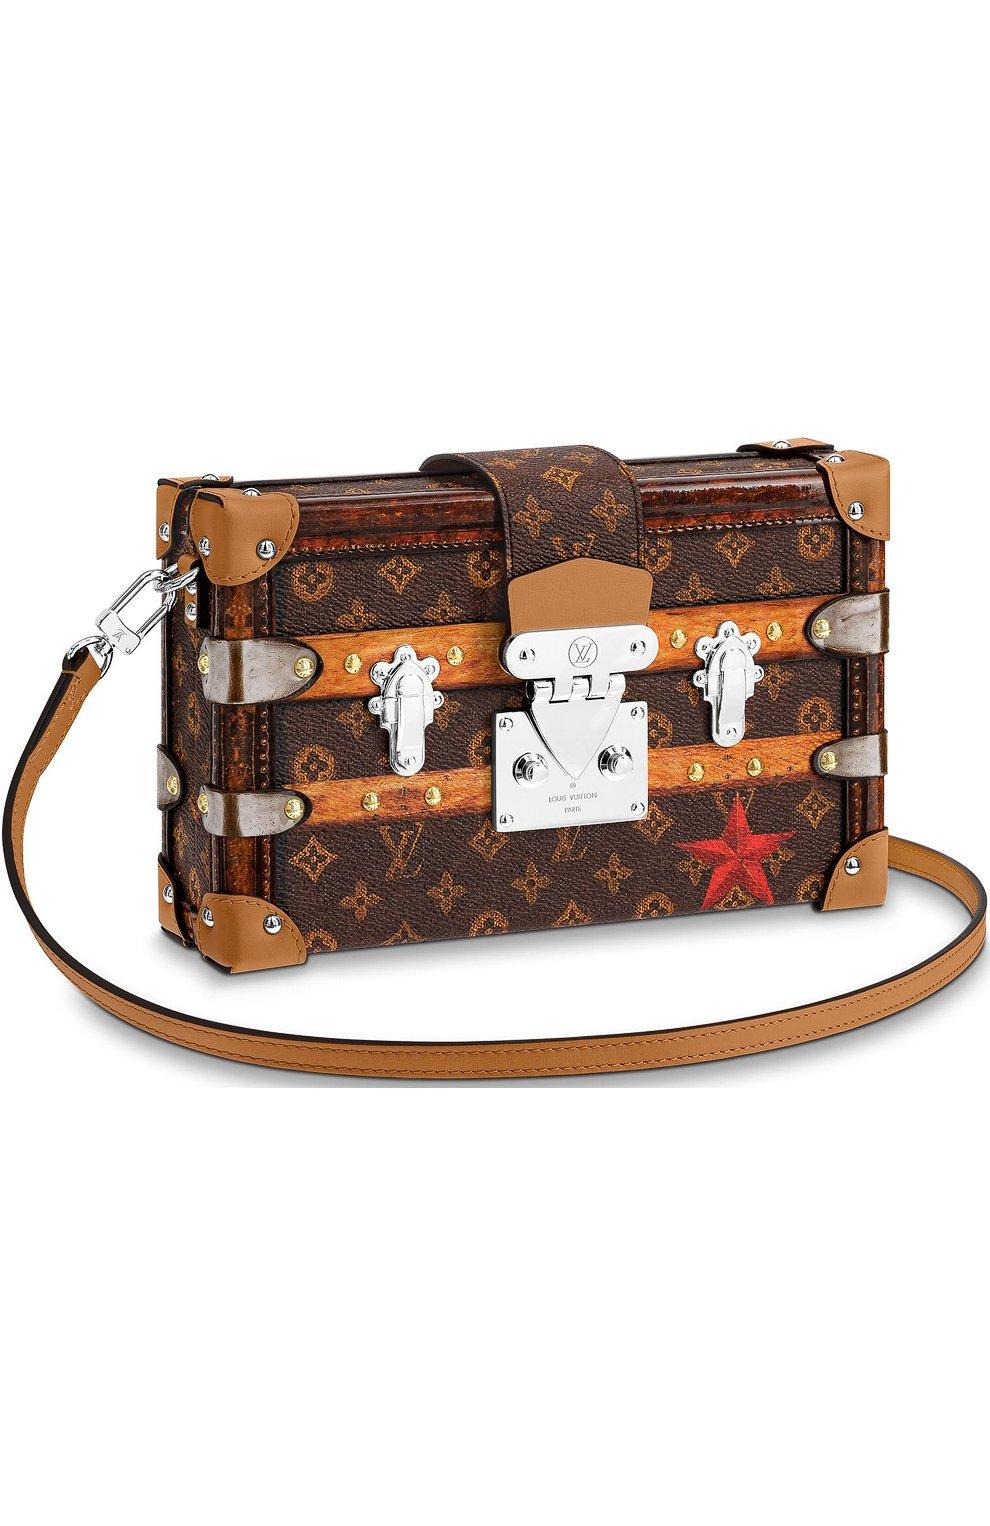 f6b6f239cea8 Женская сумка petite malle time trunk LOUIS VUITTON коричневая цвета ...